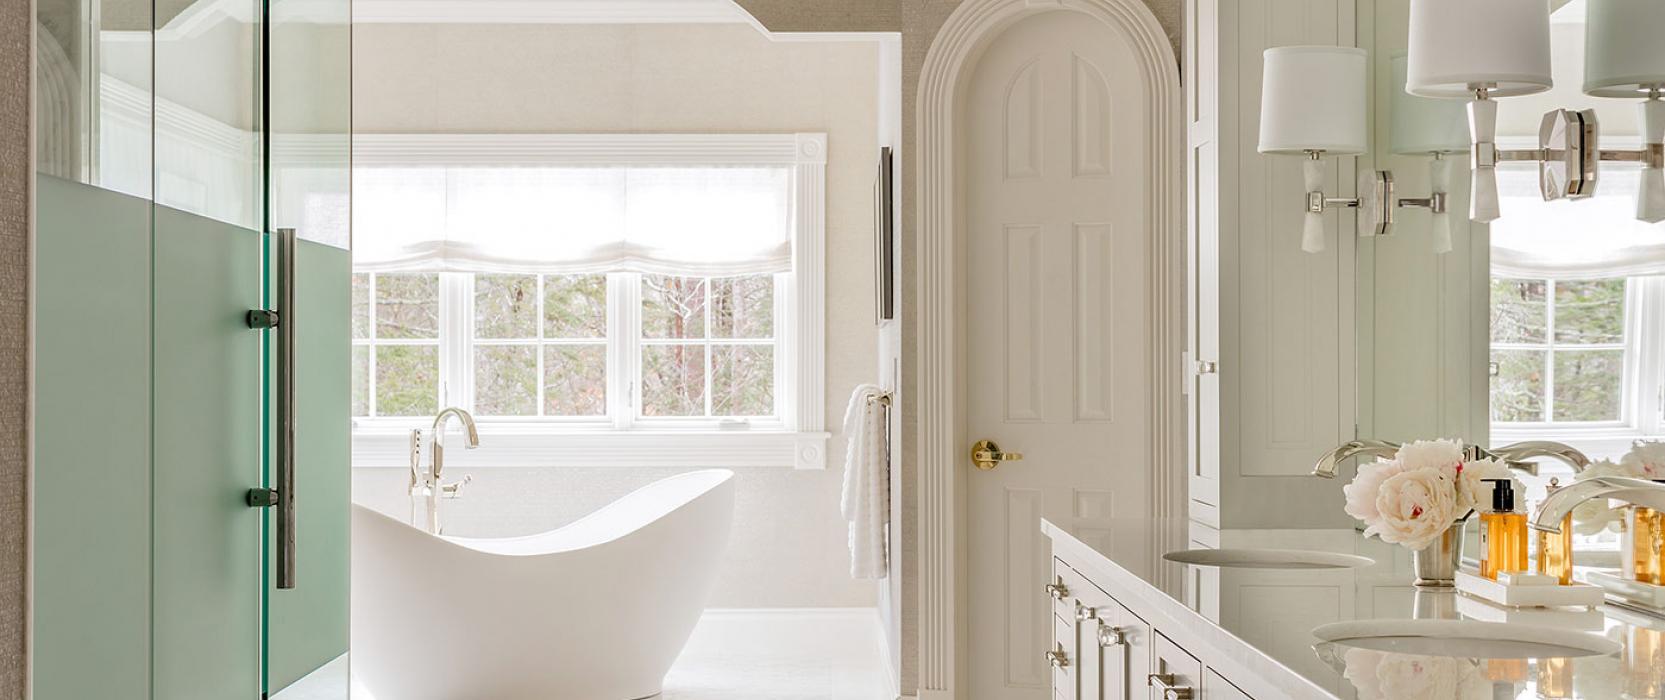 High-end master bath custom designed by Betsy Bassett Interiors